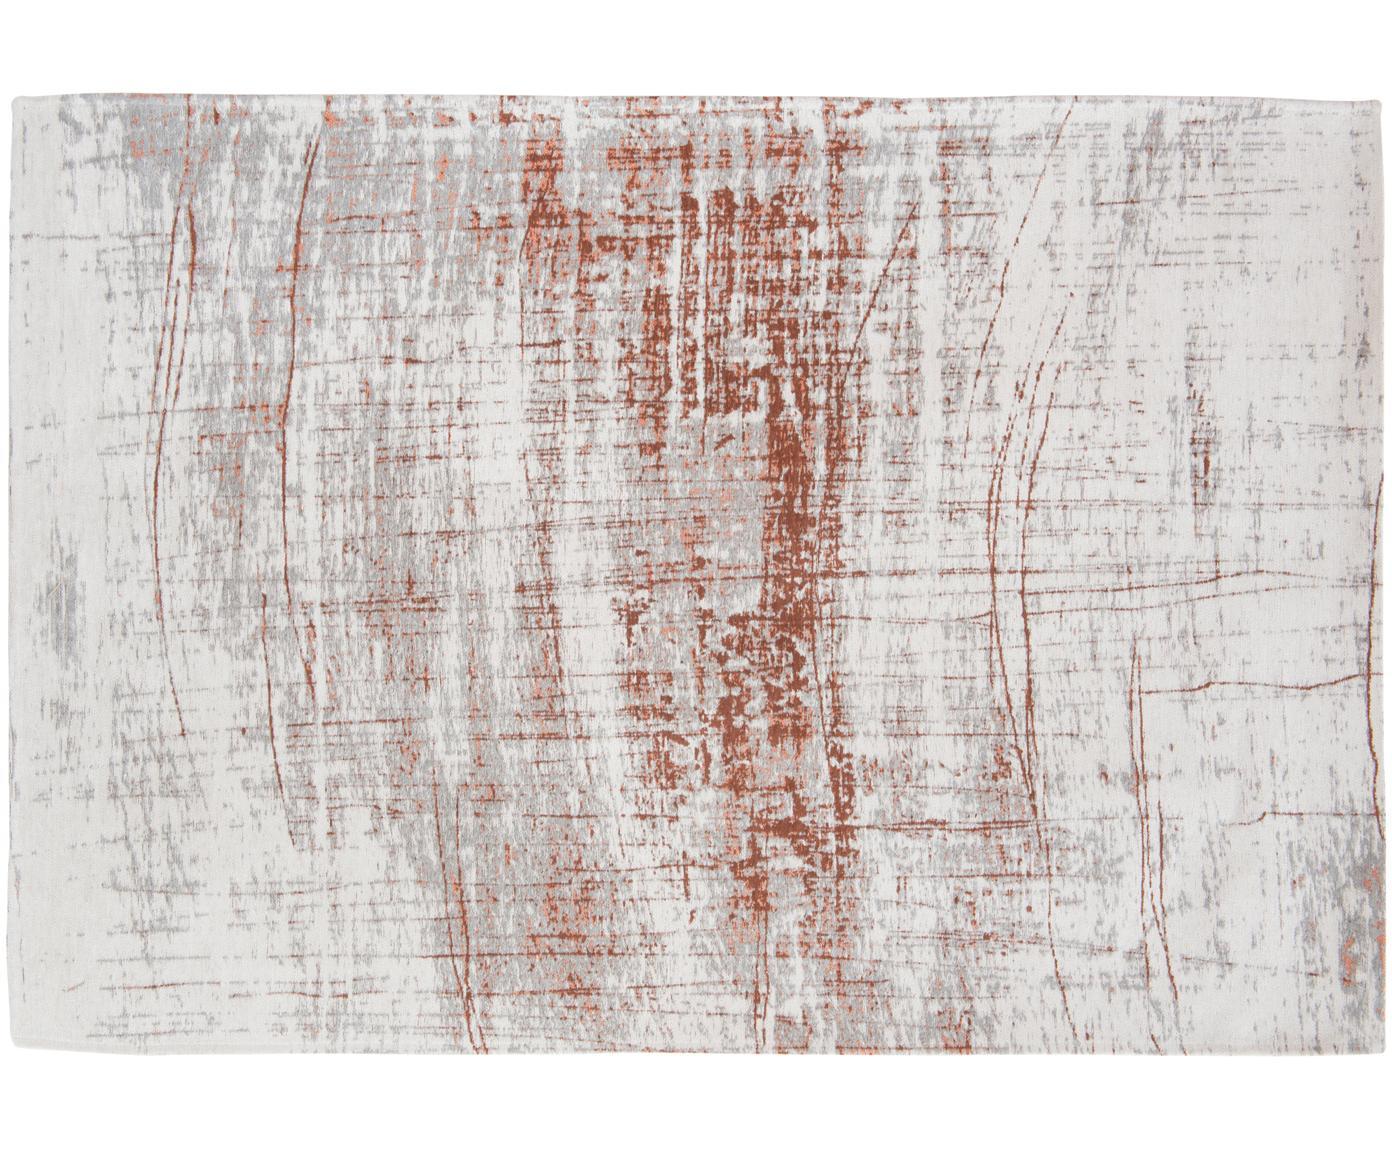 Alfombra Griff, Parte superior: 85%algodón, 15%hilos de, Reverso: mezcla de algodón, recubi, Gris, bronce, blanco crudo, An 140 x L 200 cm (Tamaño S)